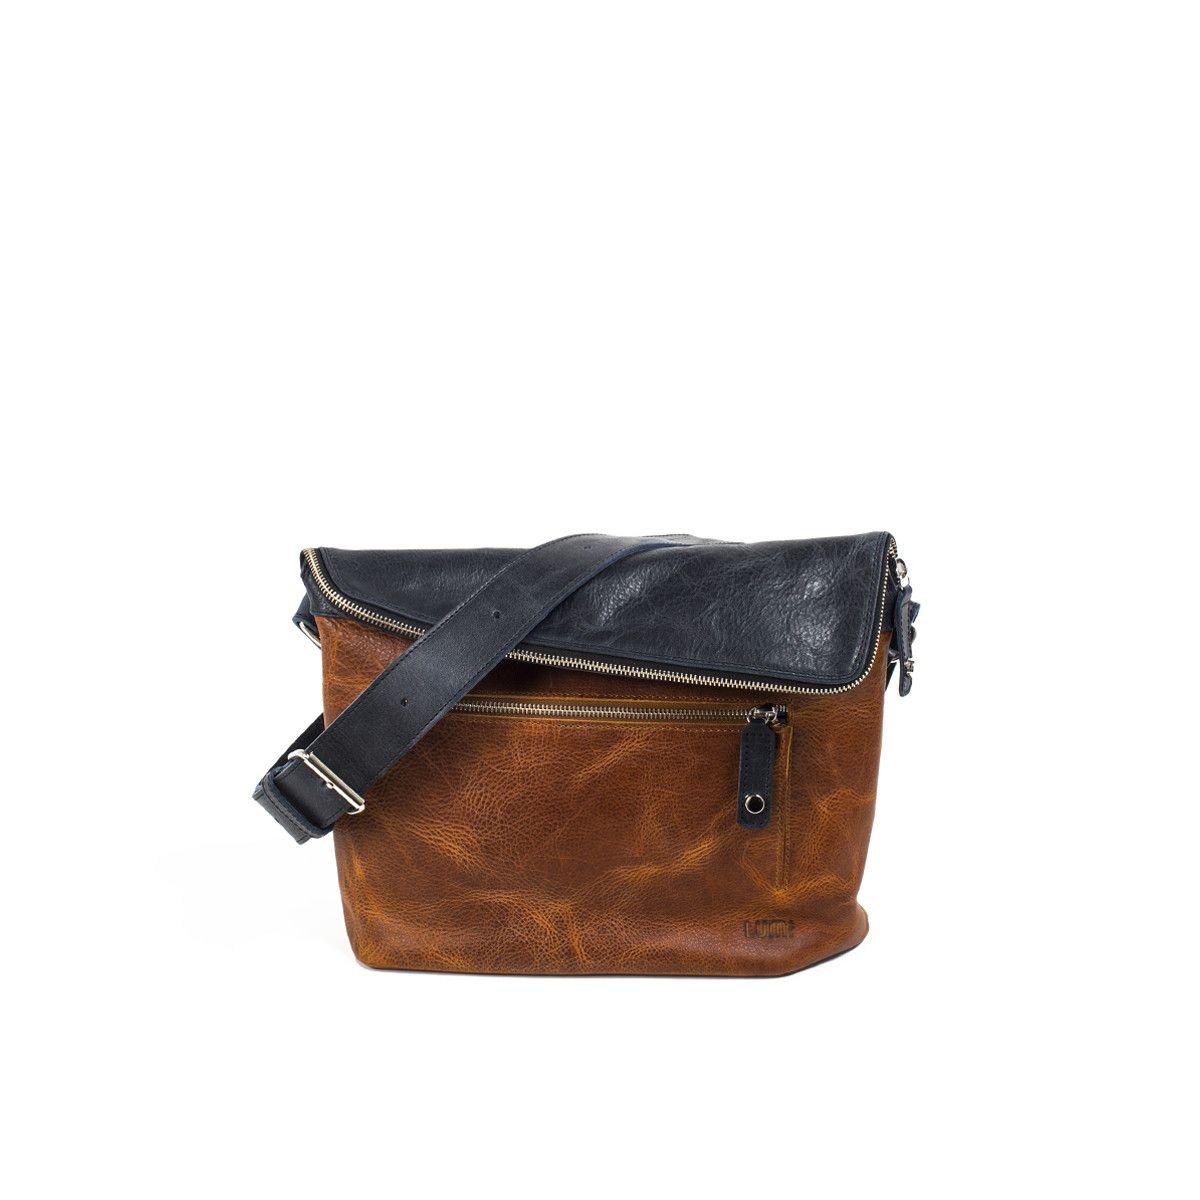 81f36eb3a9 Tomi Small Messenger Bag Cognac   Navy - Lumi Accessories